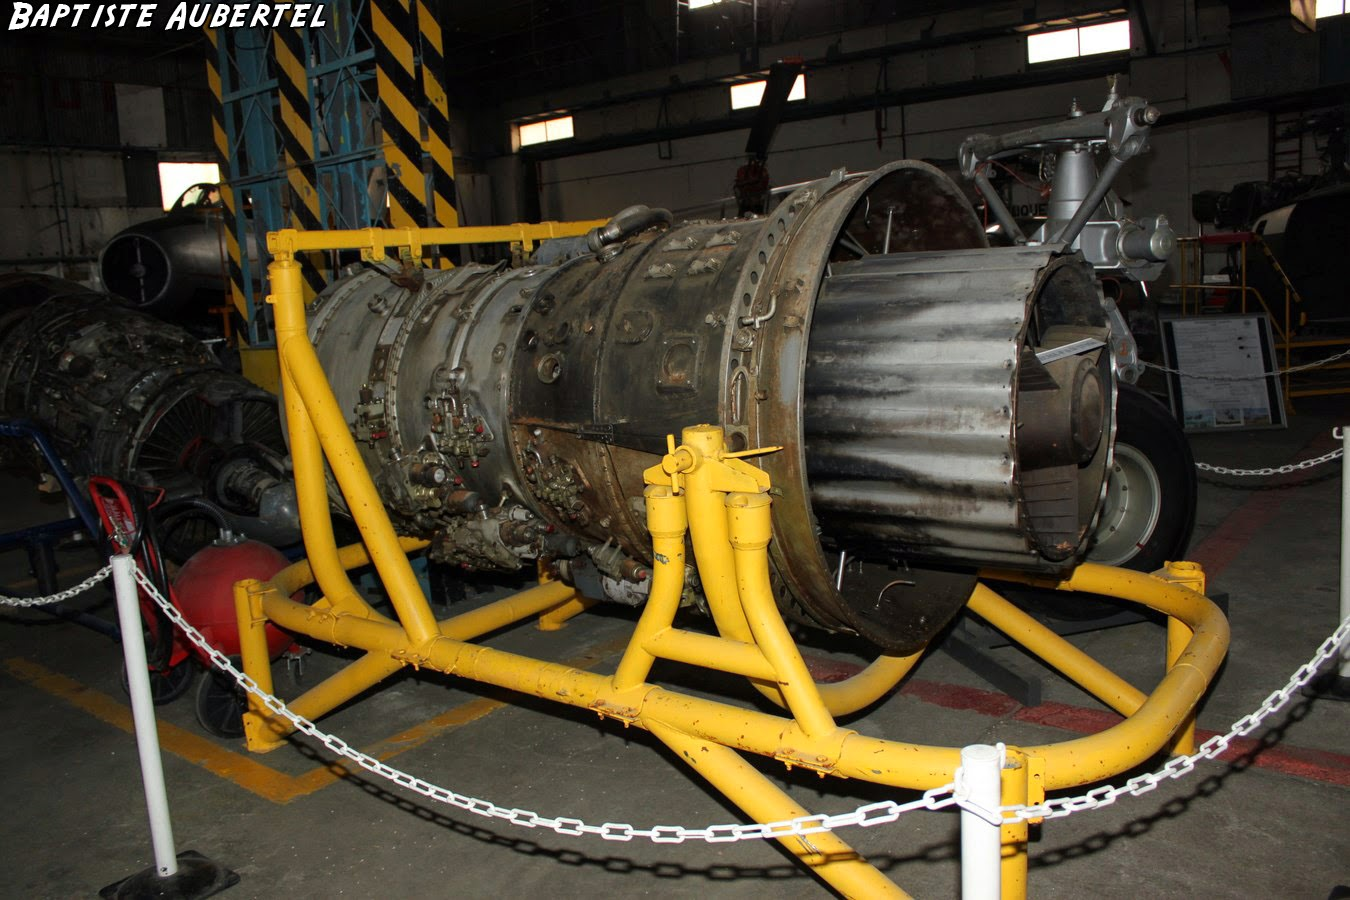 Mirage III T